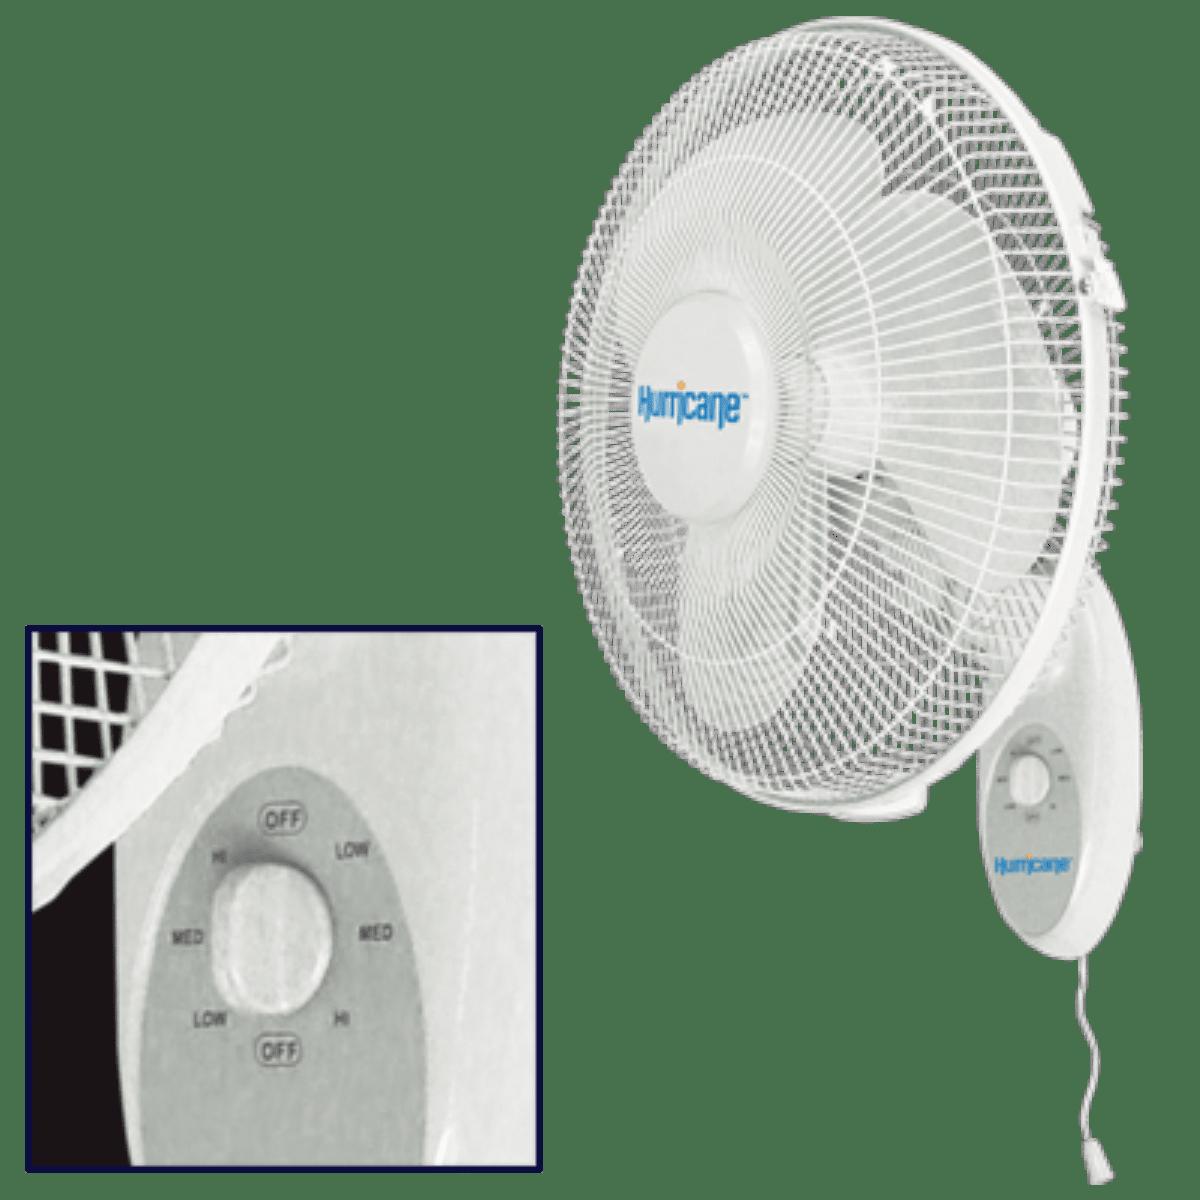 Hurricane 736505 Supreme Wall Mount Fan 16 inch